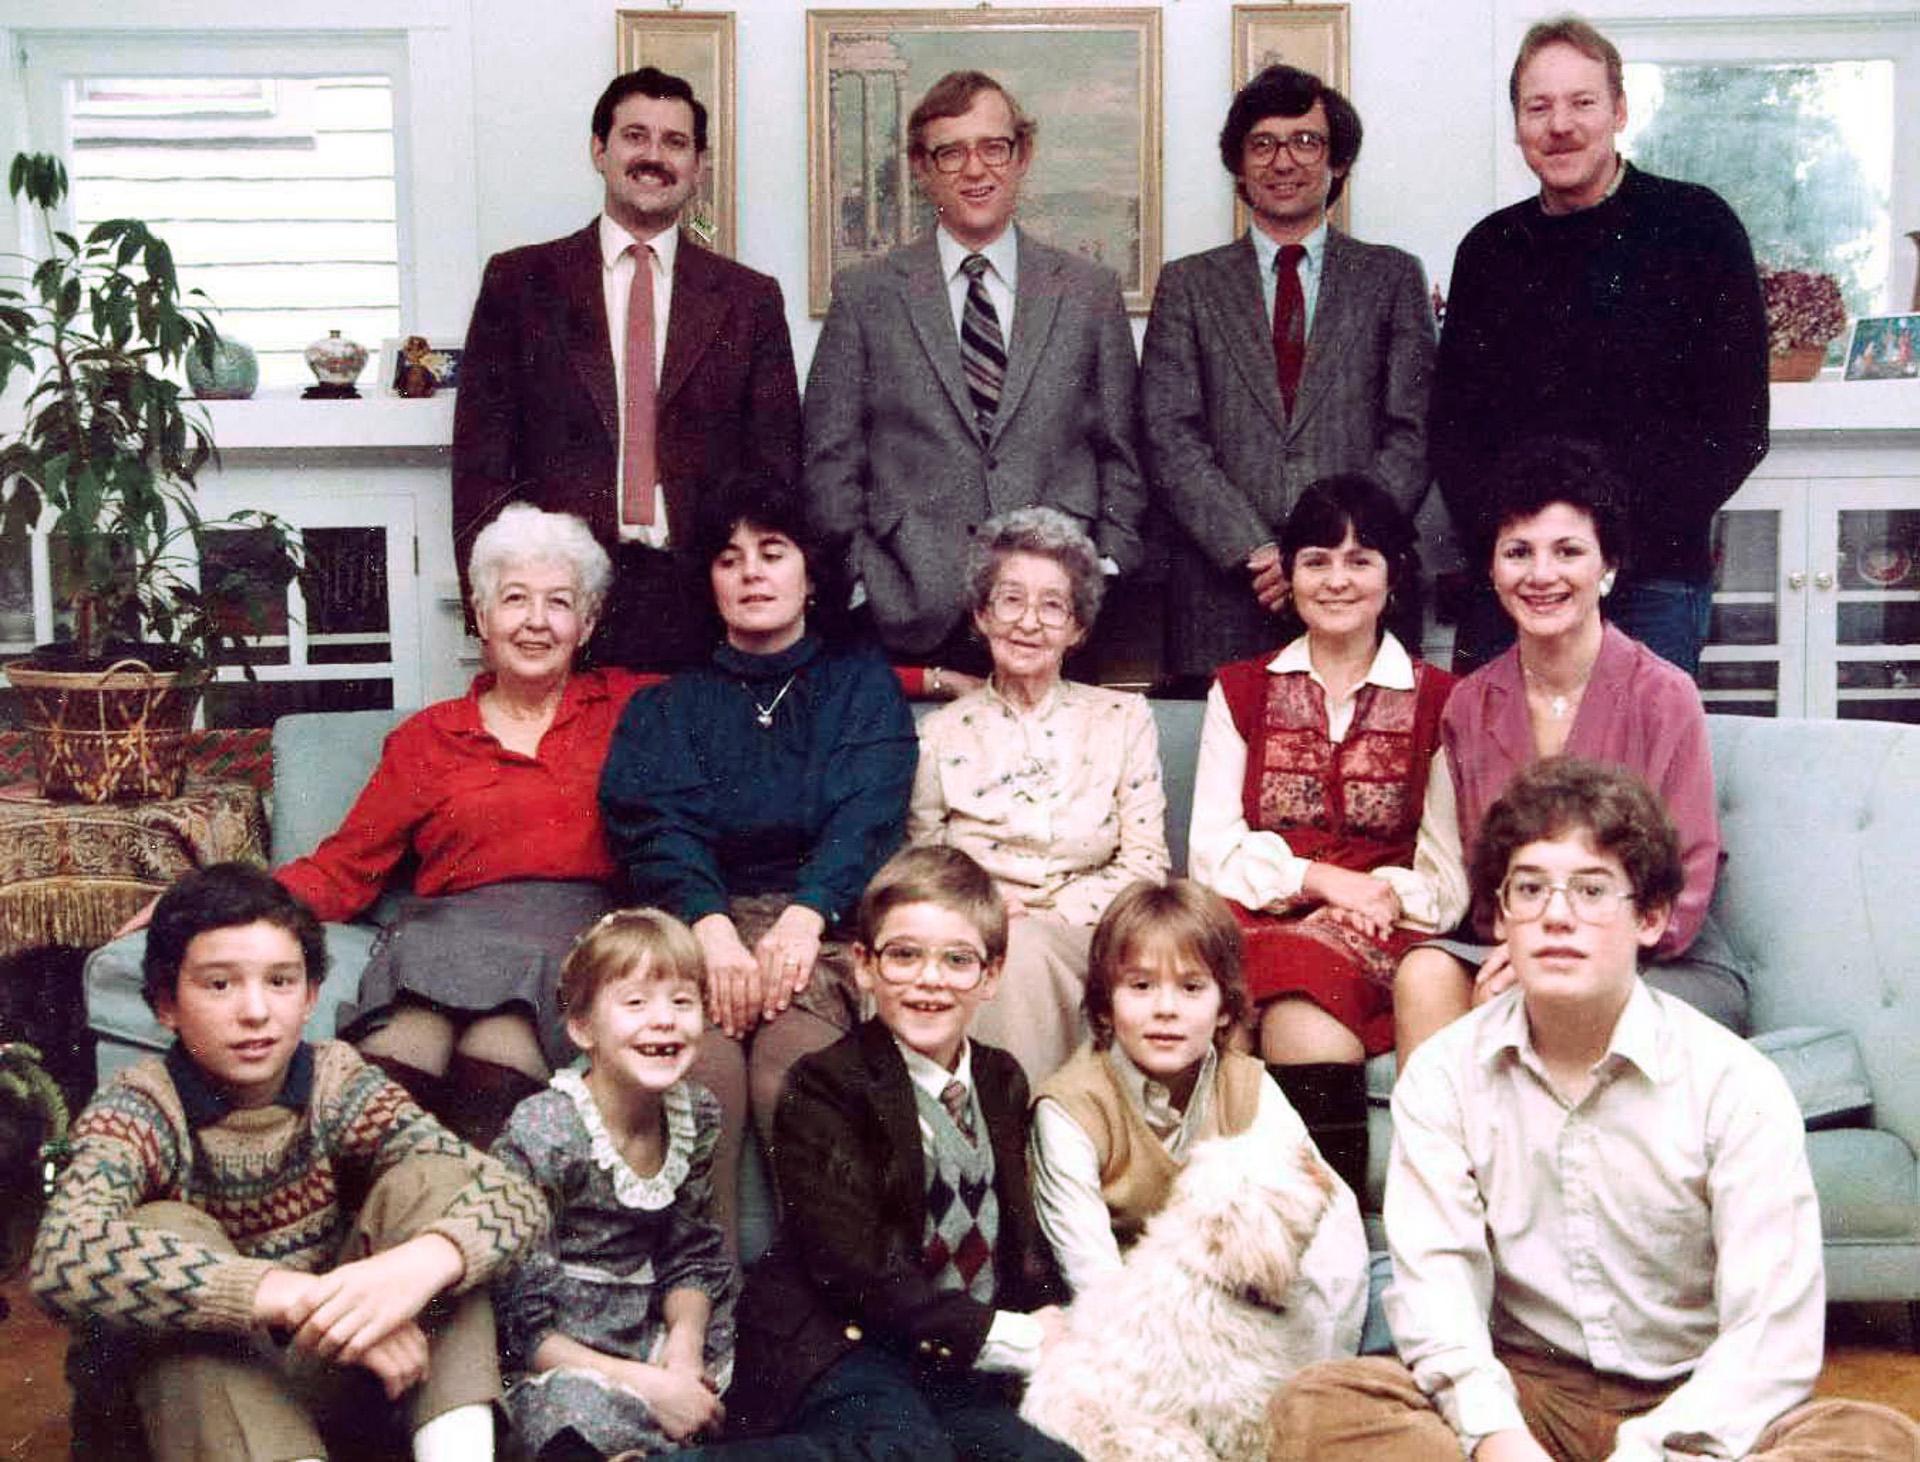 37a-Presentation-Mary-Boyer-and-family_16_1350px_1920px.jpg